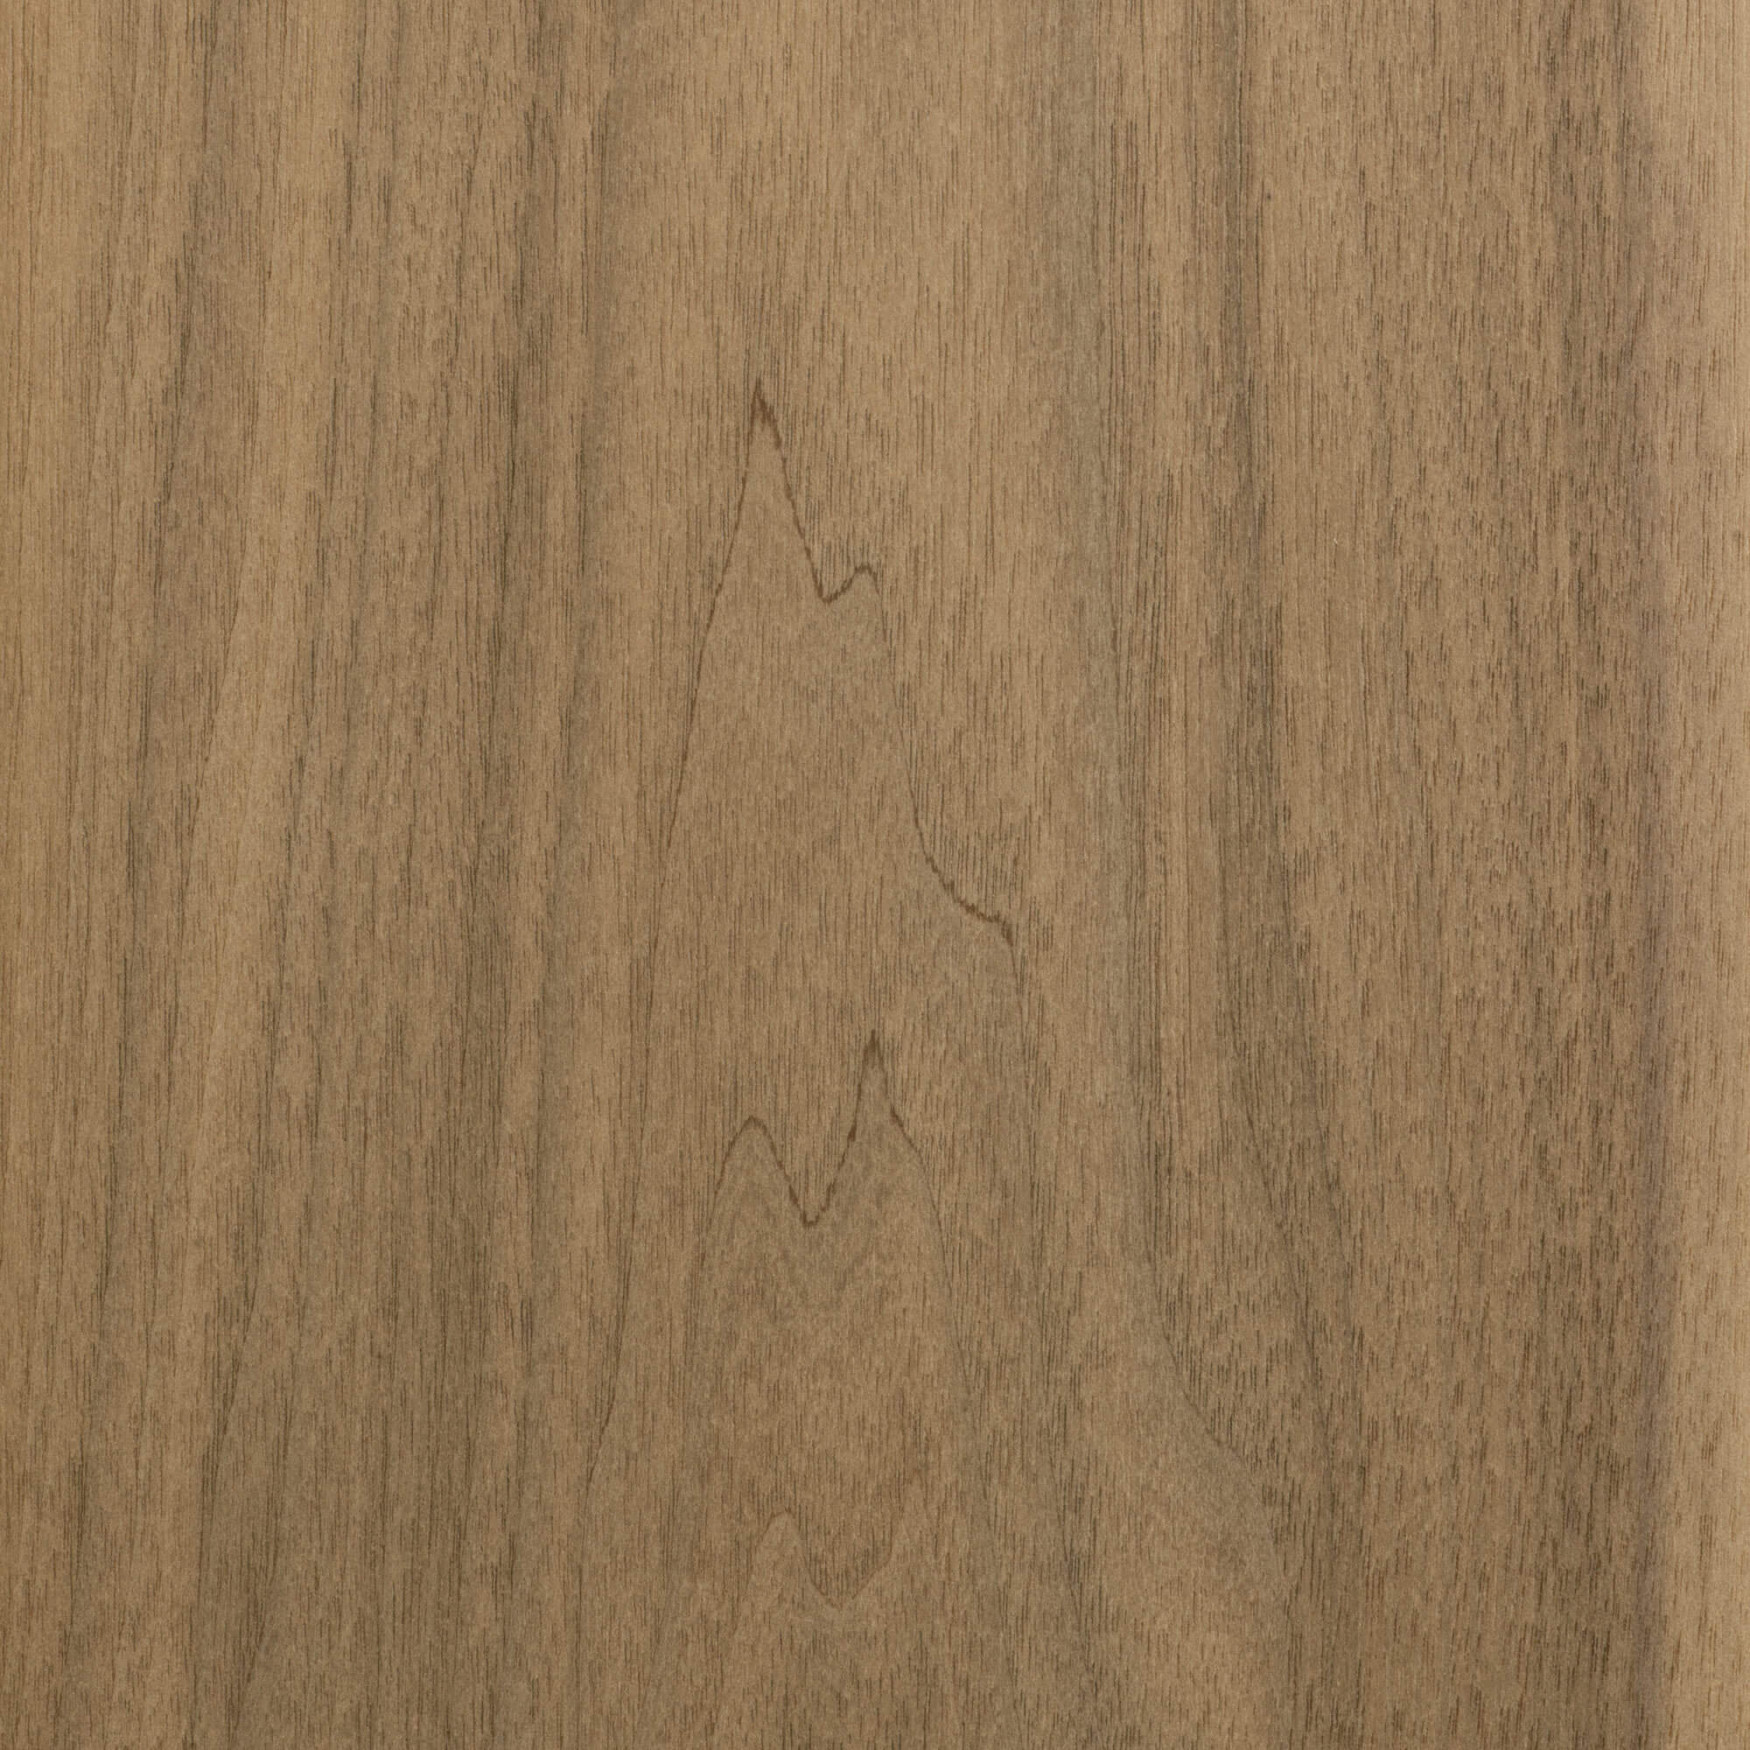 Element7-wide-plank-samples-RT-Pale-Walnut